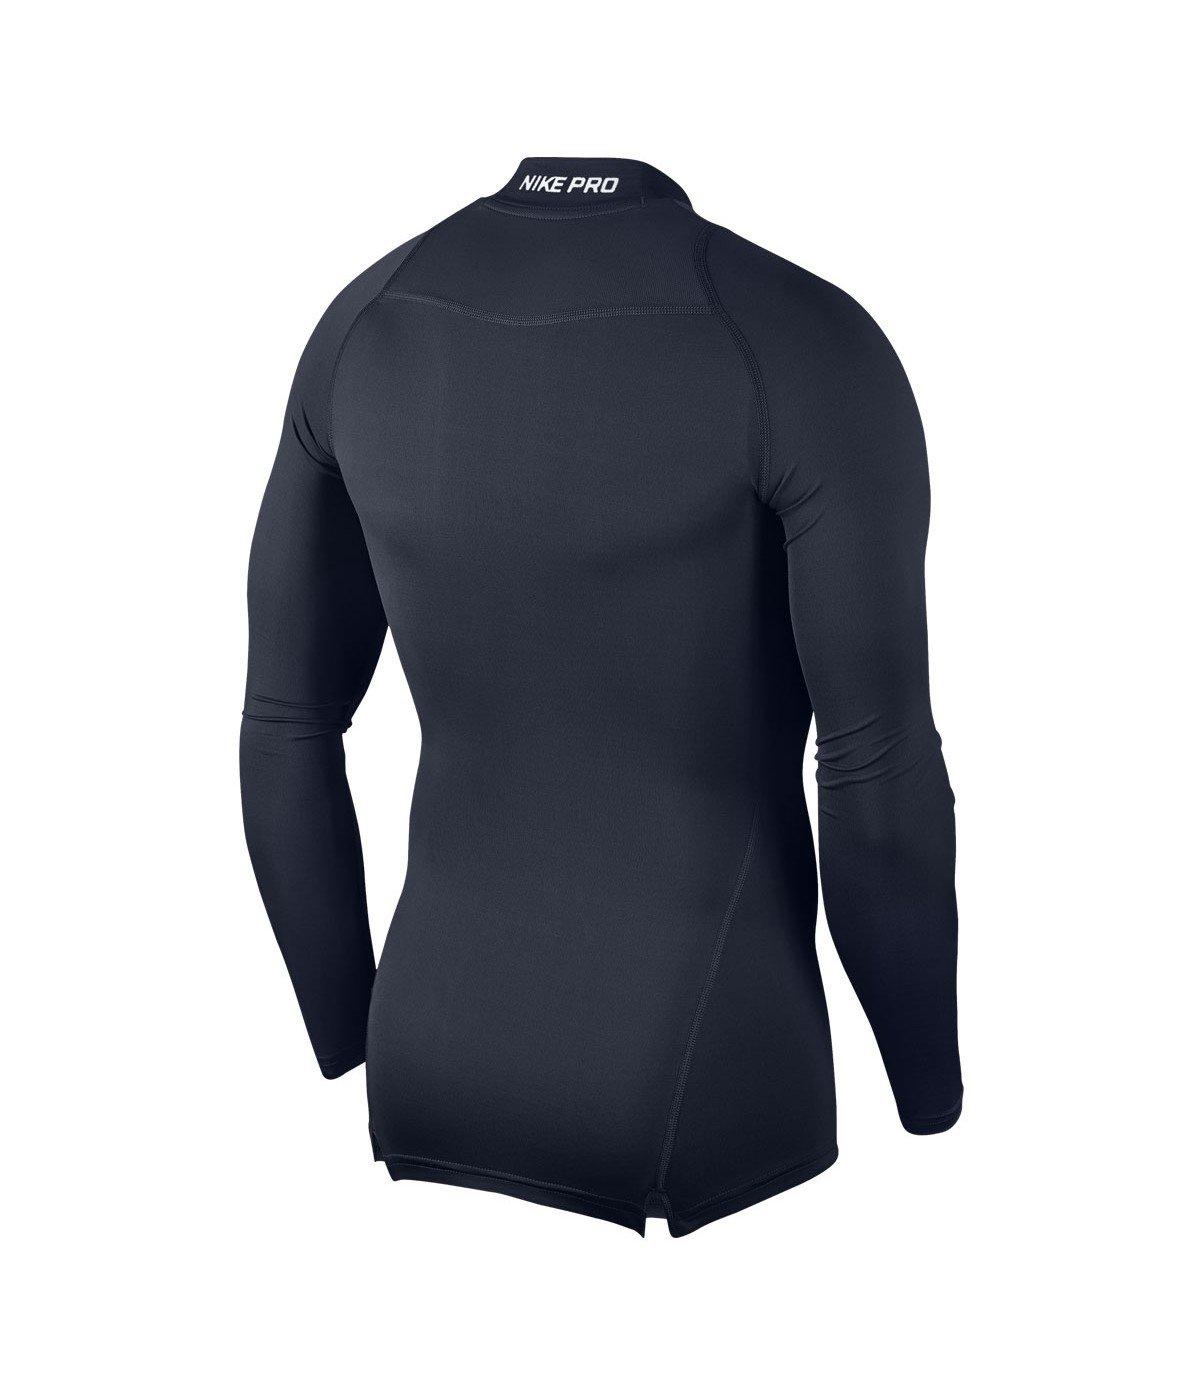 037605c9a343 Nike Men s Cool Compression Mock Long Sleeve Shirt  Amazon.co.uk  Sports    Outdoors